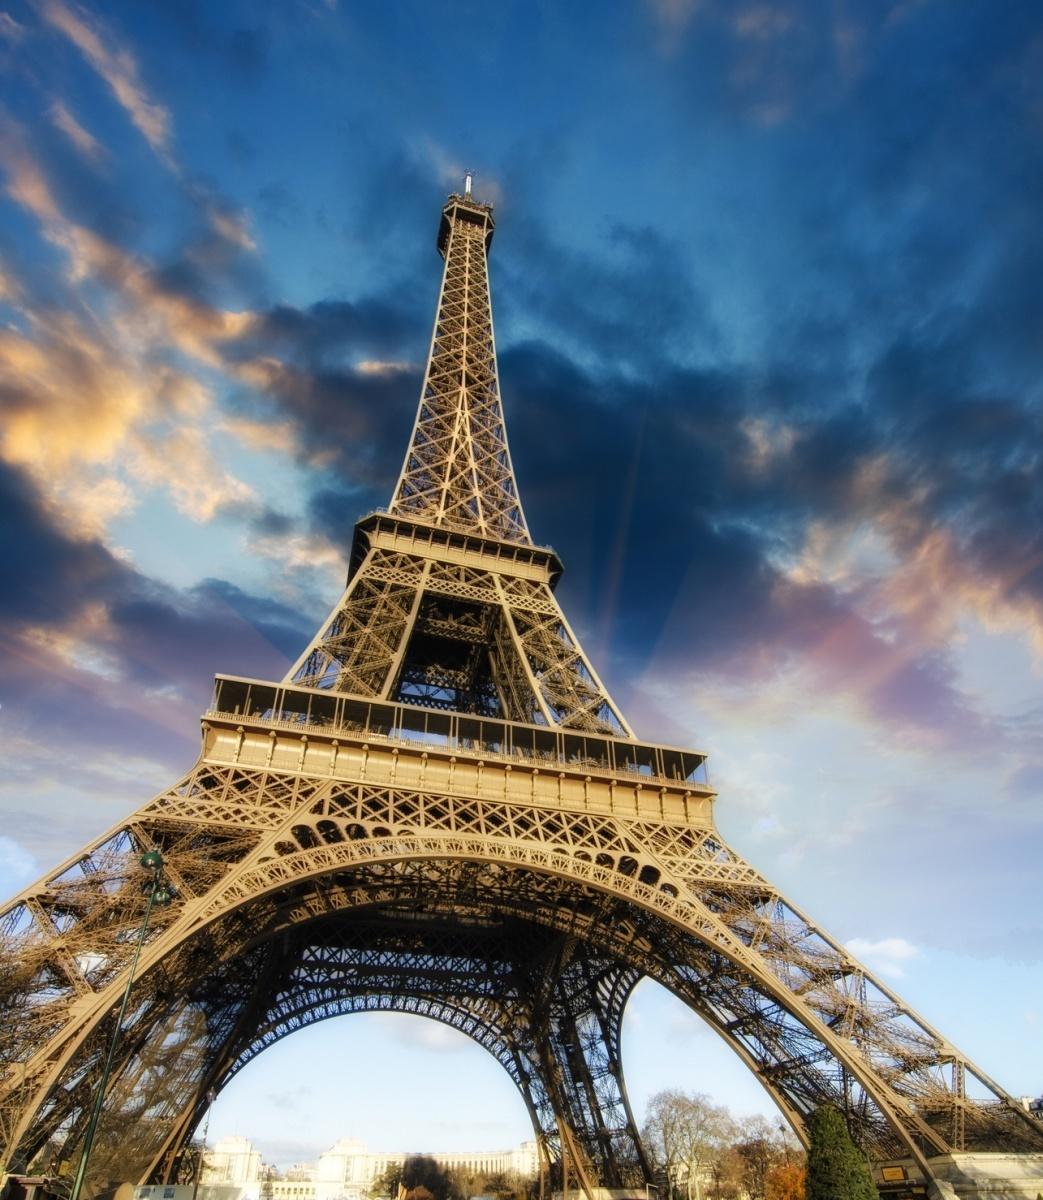 Эйфелева башня — Eiffel Tower